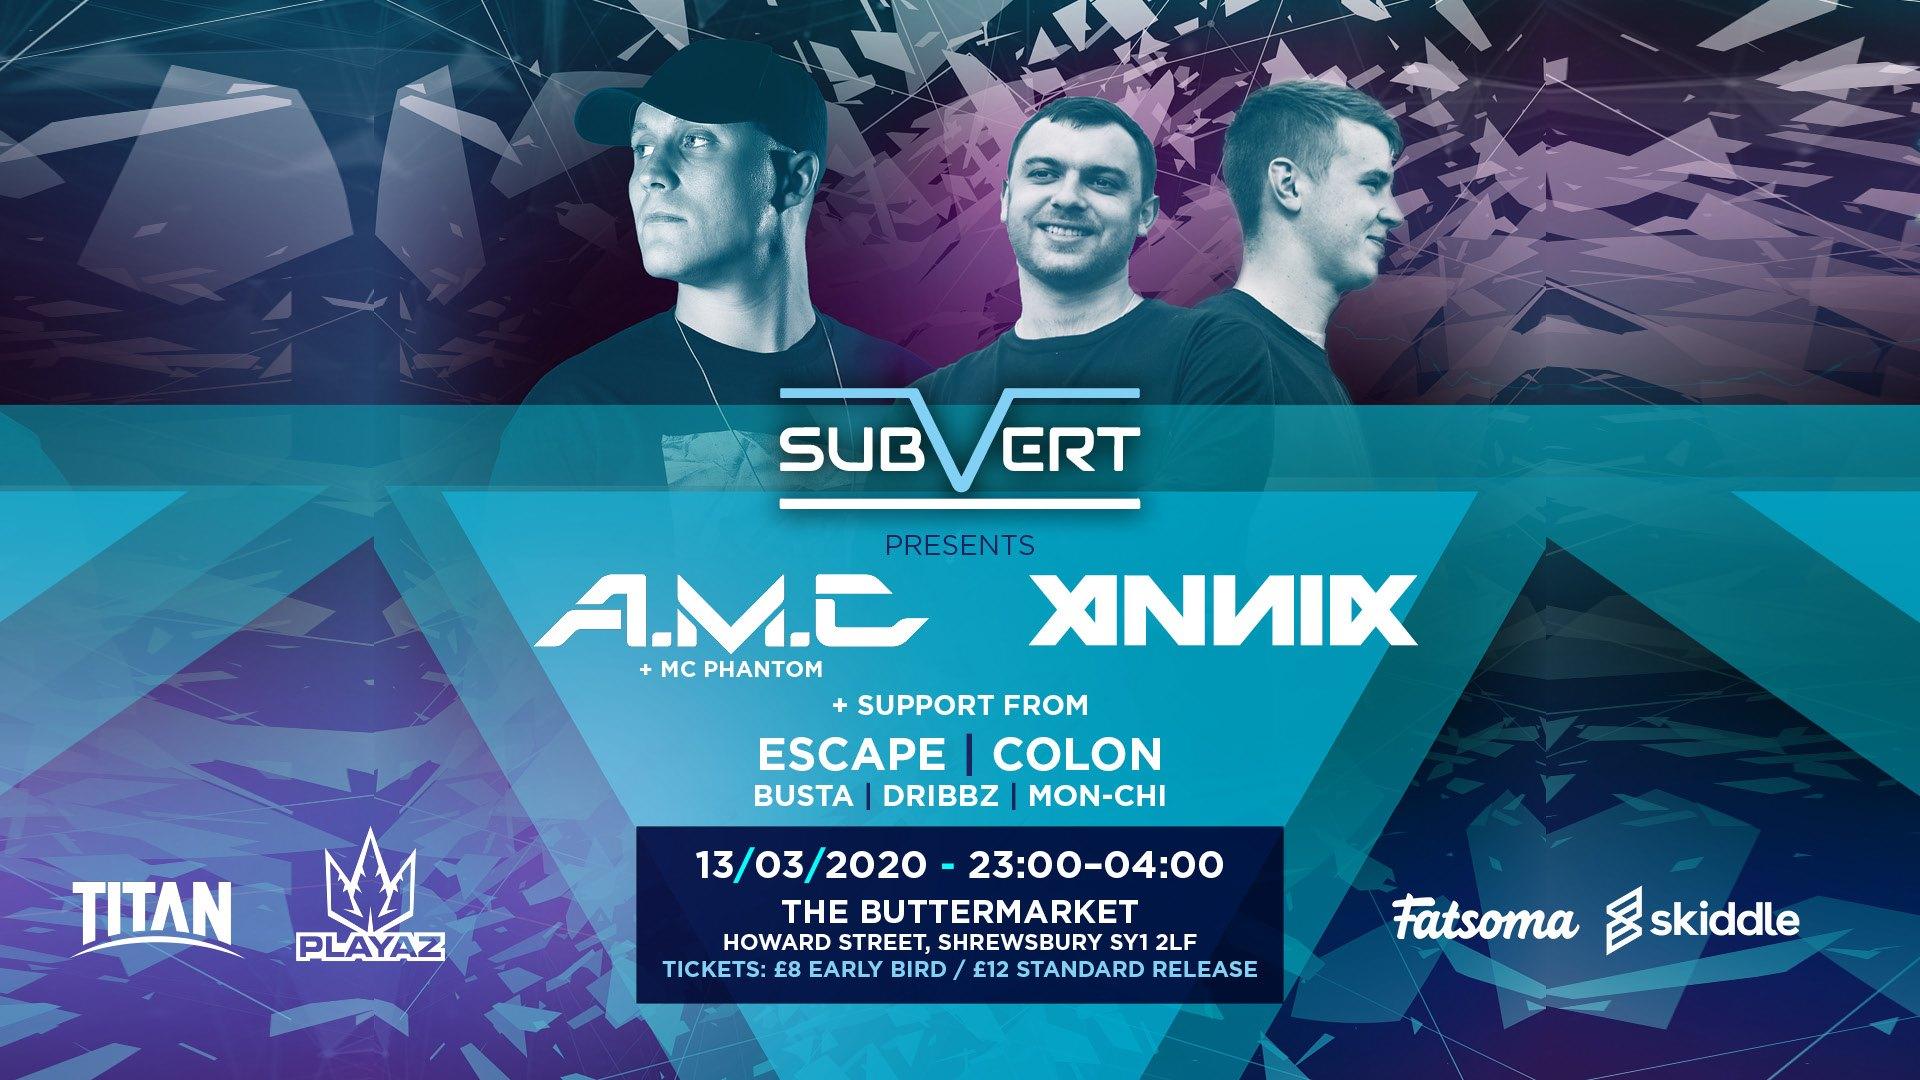 Subvert Presents A.M.C & Annix